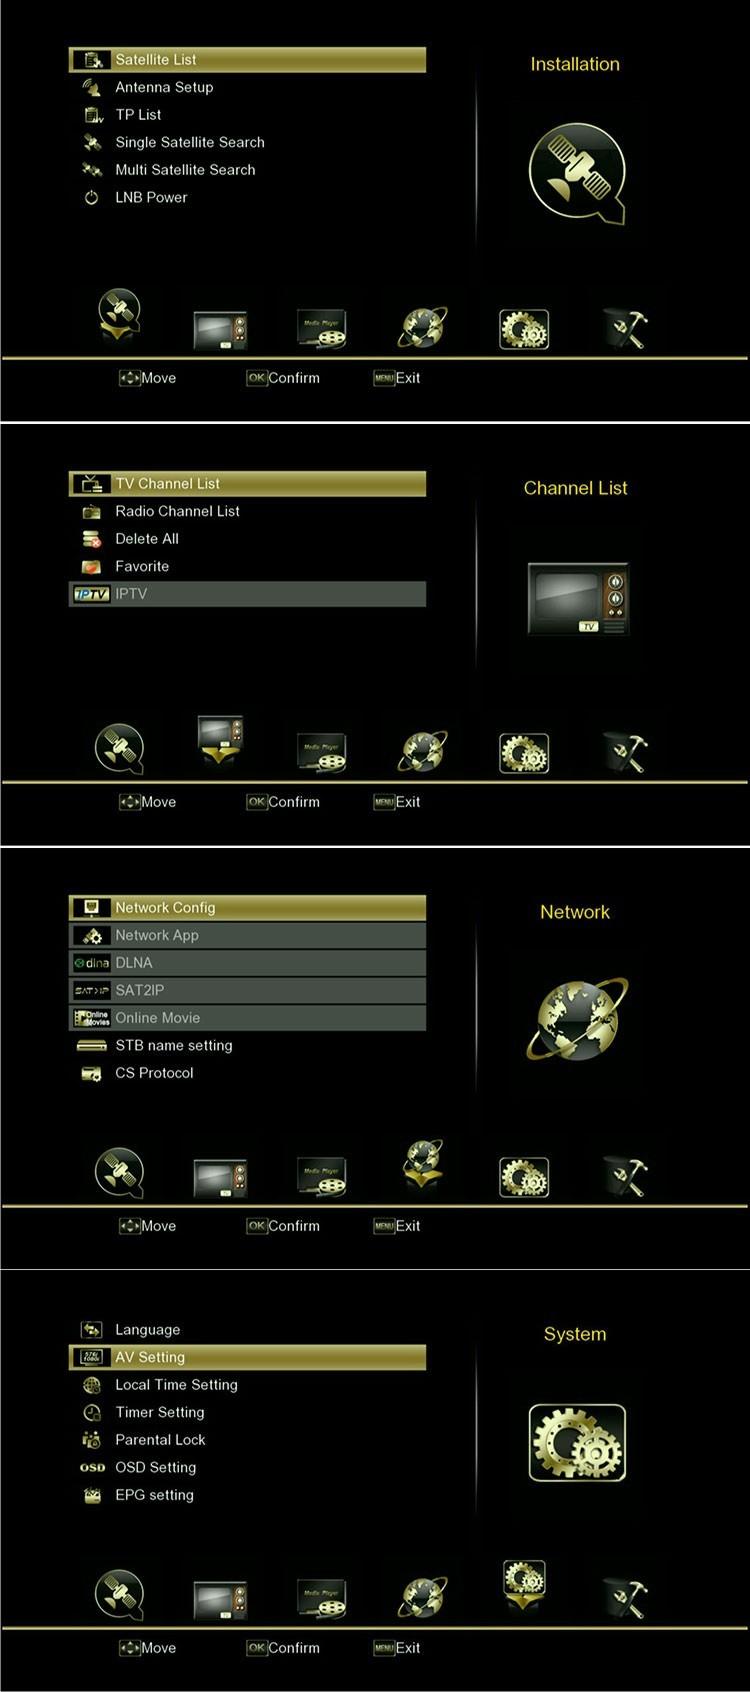 Freesat V8 Super Power Vu Hd Receiver Hd Dvb-s2 Mpeg4 Hd Receiver  Wifi,3g gprs Iks Sharing Freesat V8 Super - Buy Freesat V8 Super Satelliter  Receiver